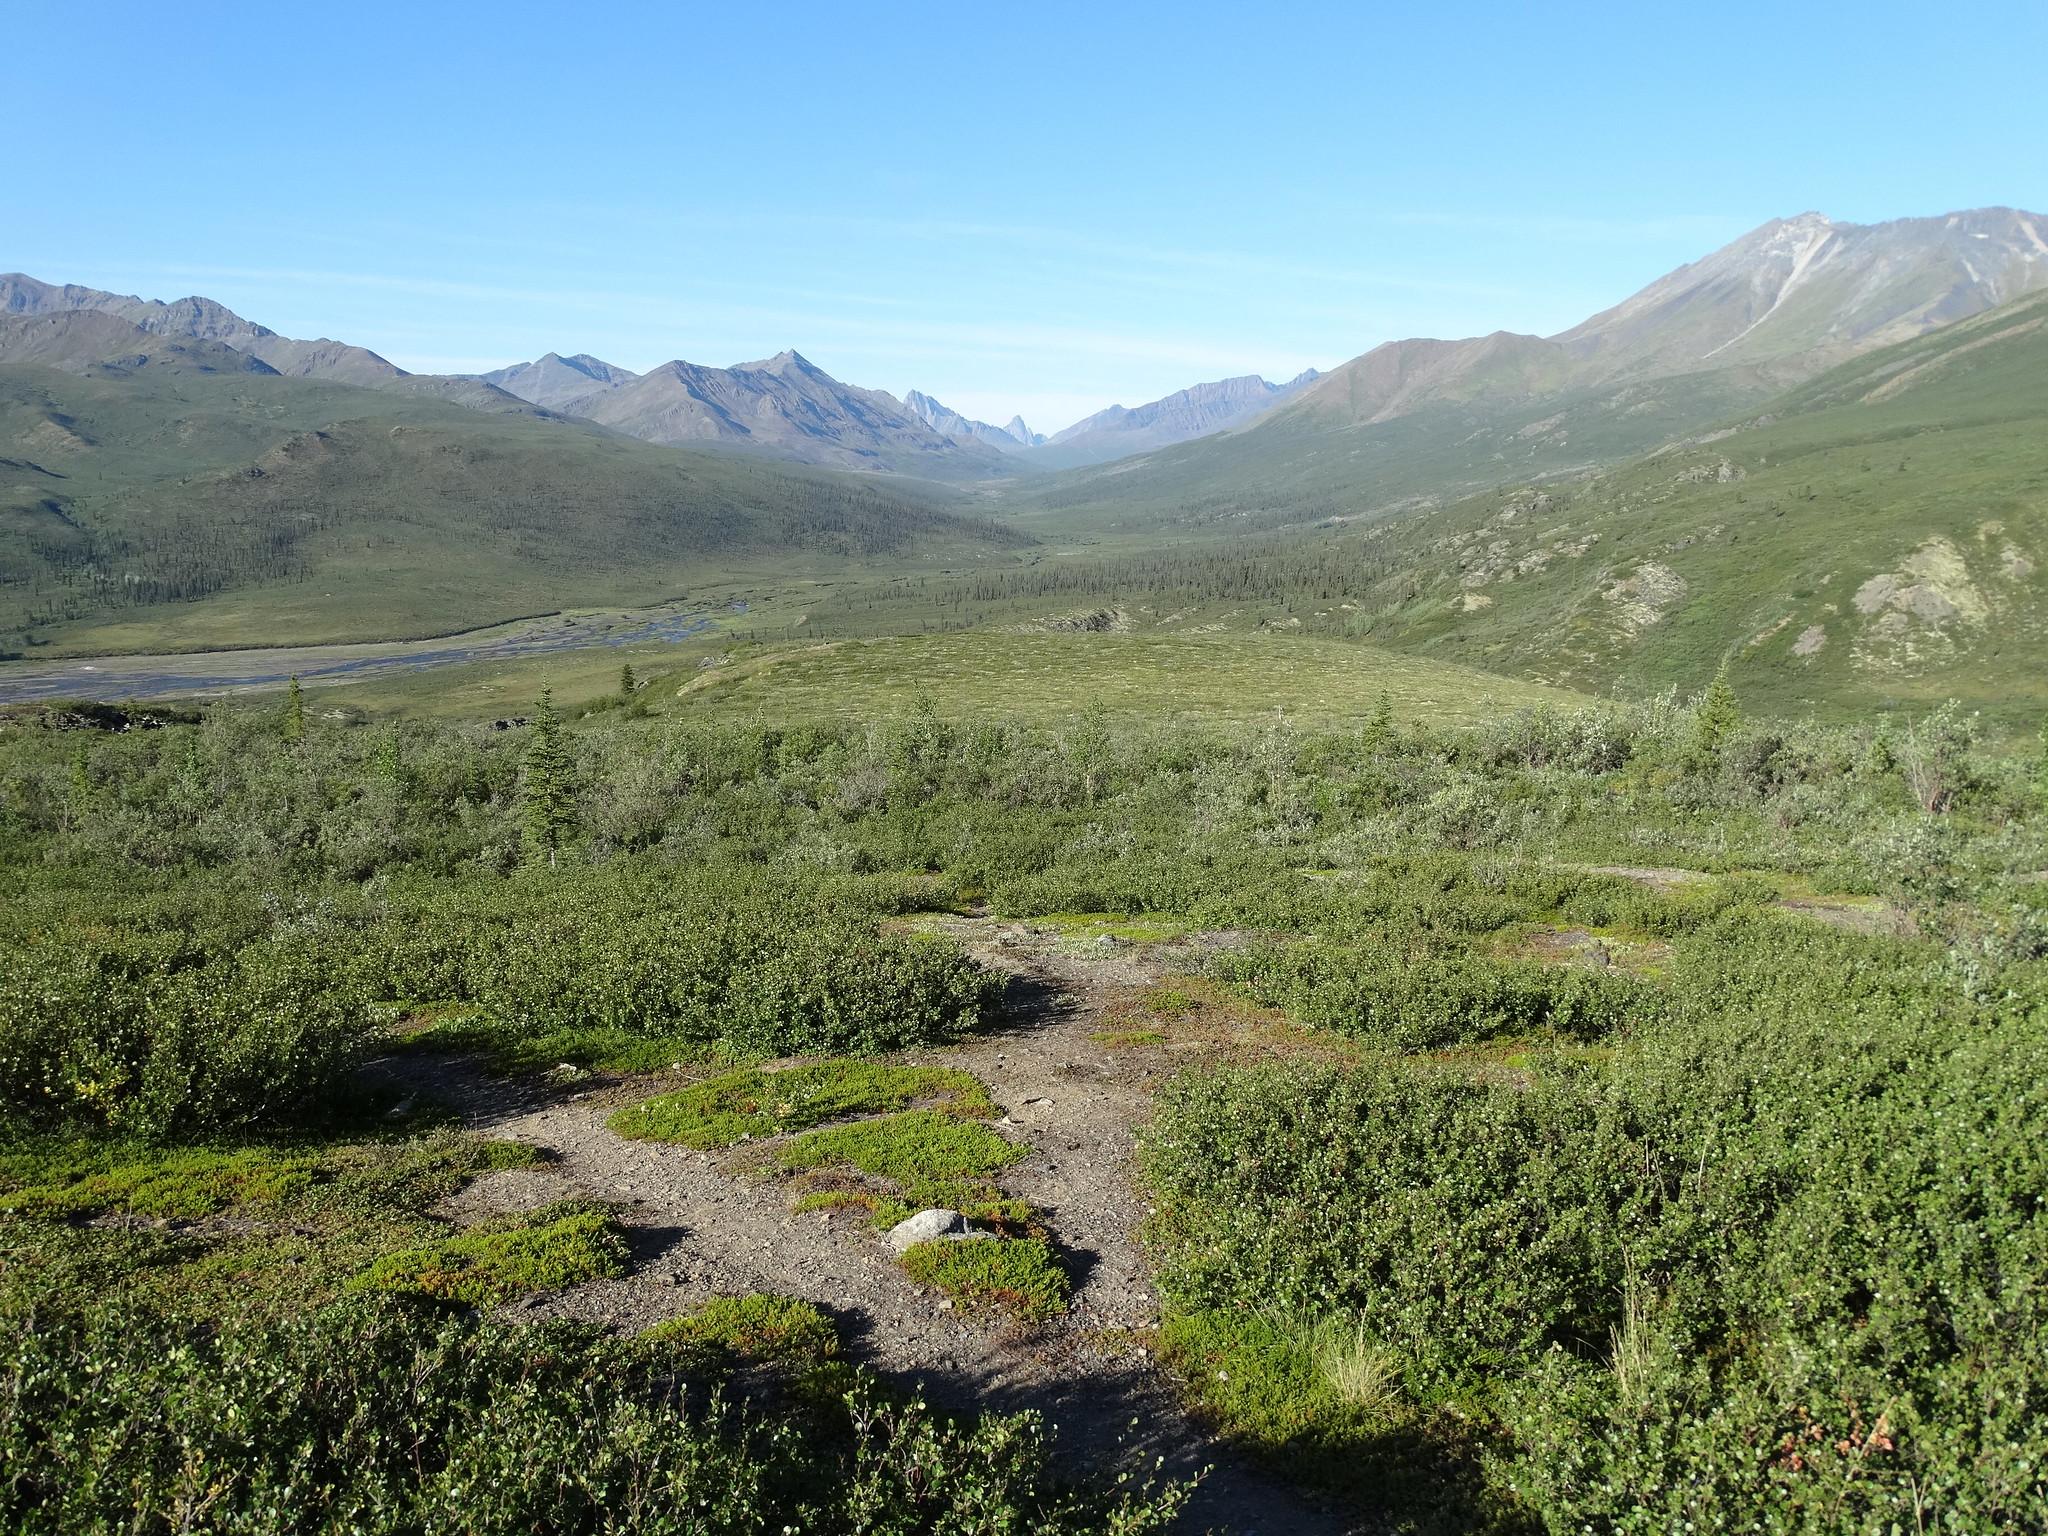 Alaska and the Yukon | Tombstone Territorial Park, Yukon, Canada